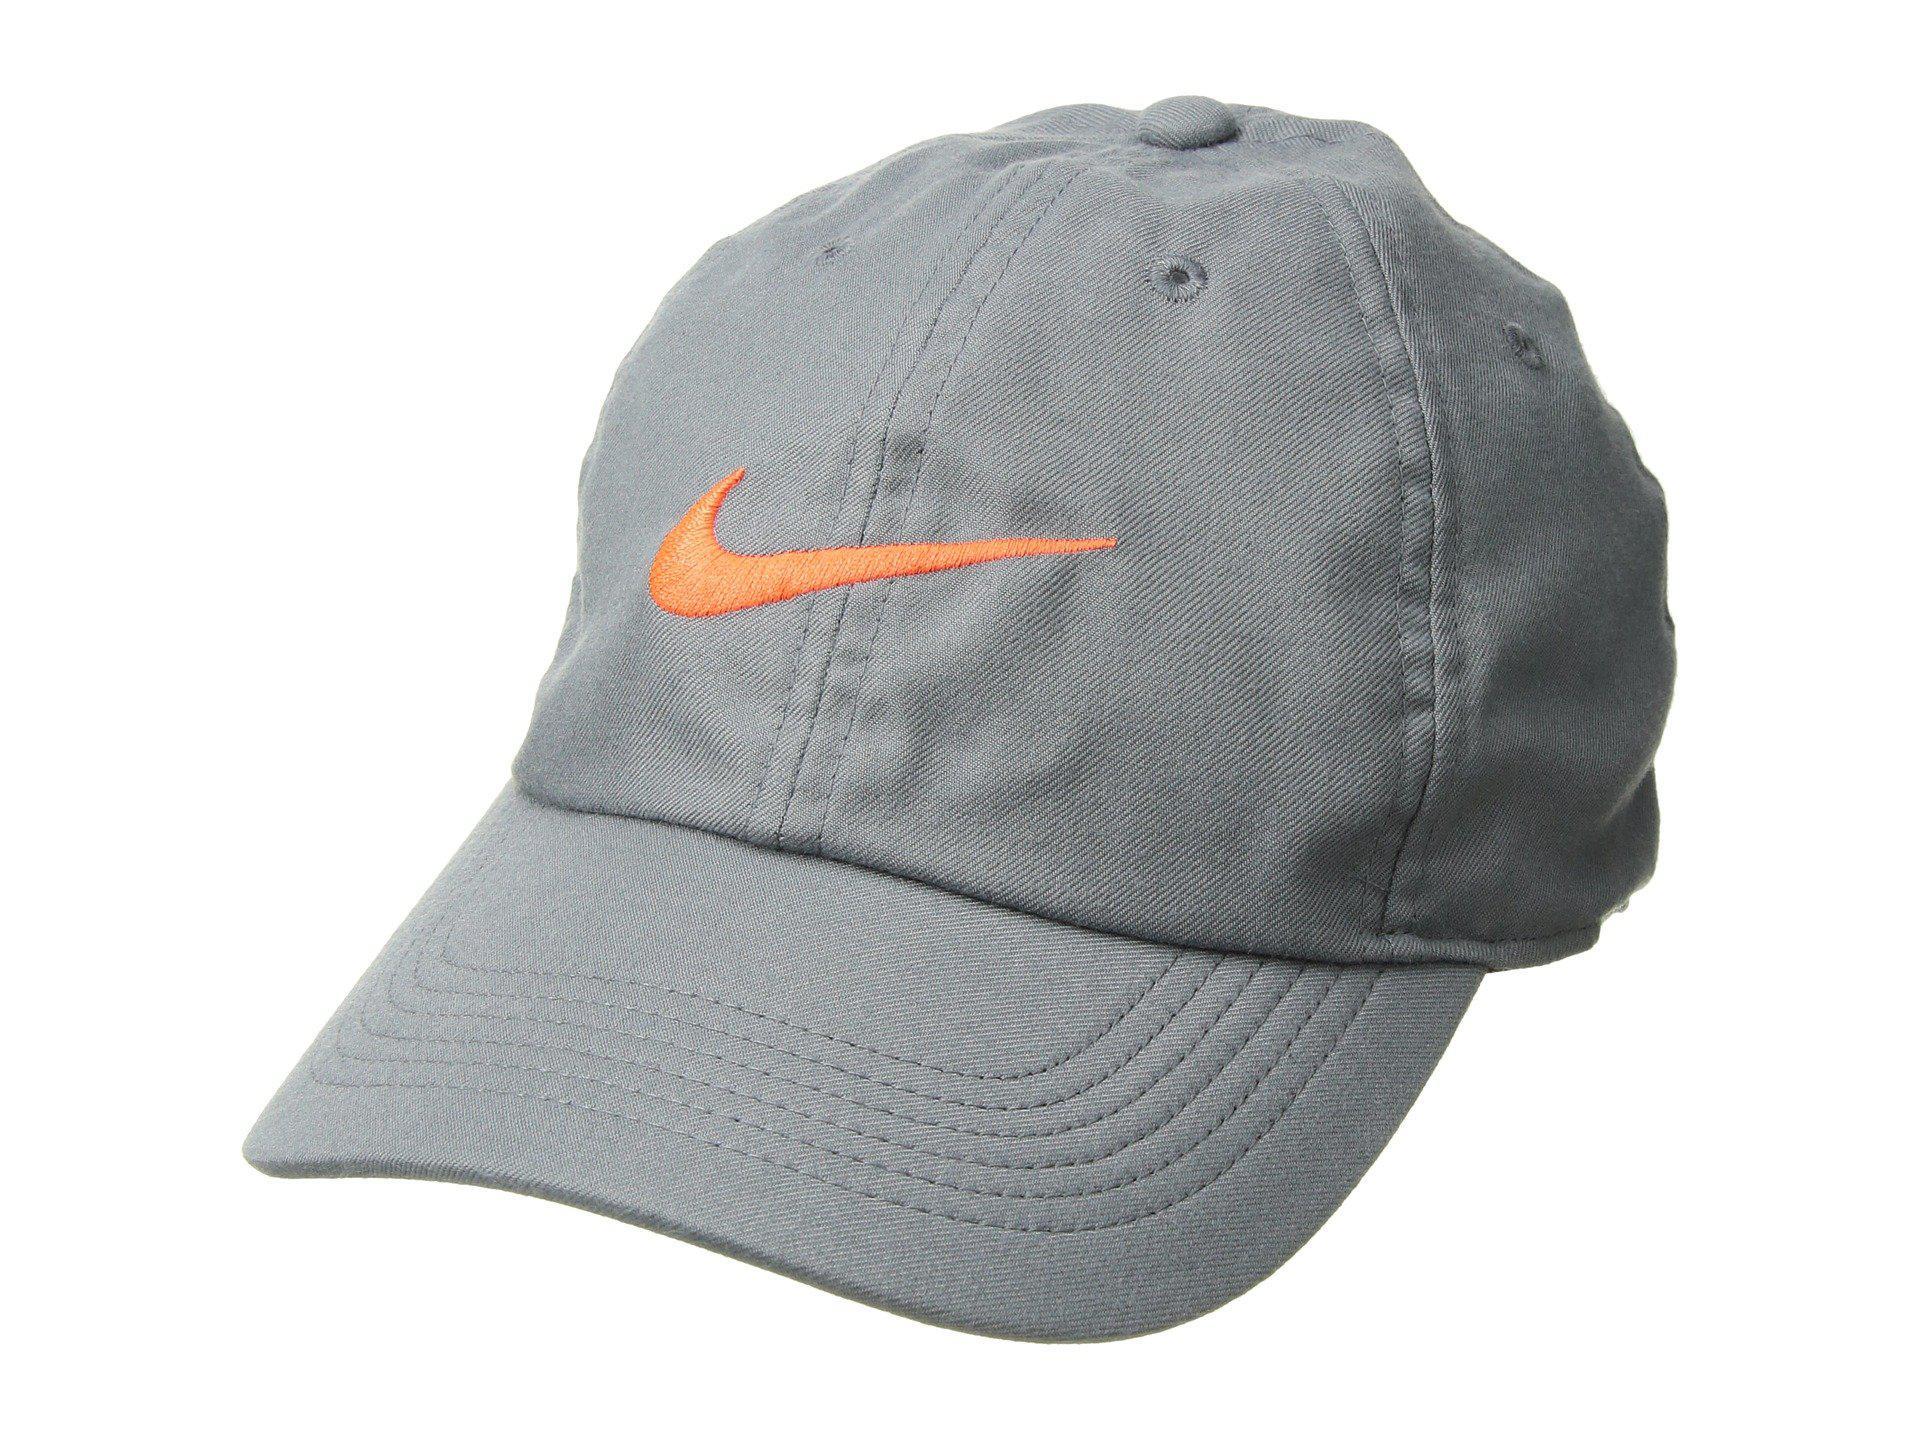 79c1acad50202 Lyst - Nike Train Twill H86 Hat (white/black/black) Caps in Gray for Men